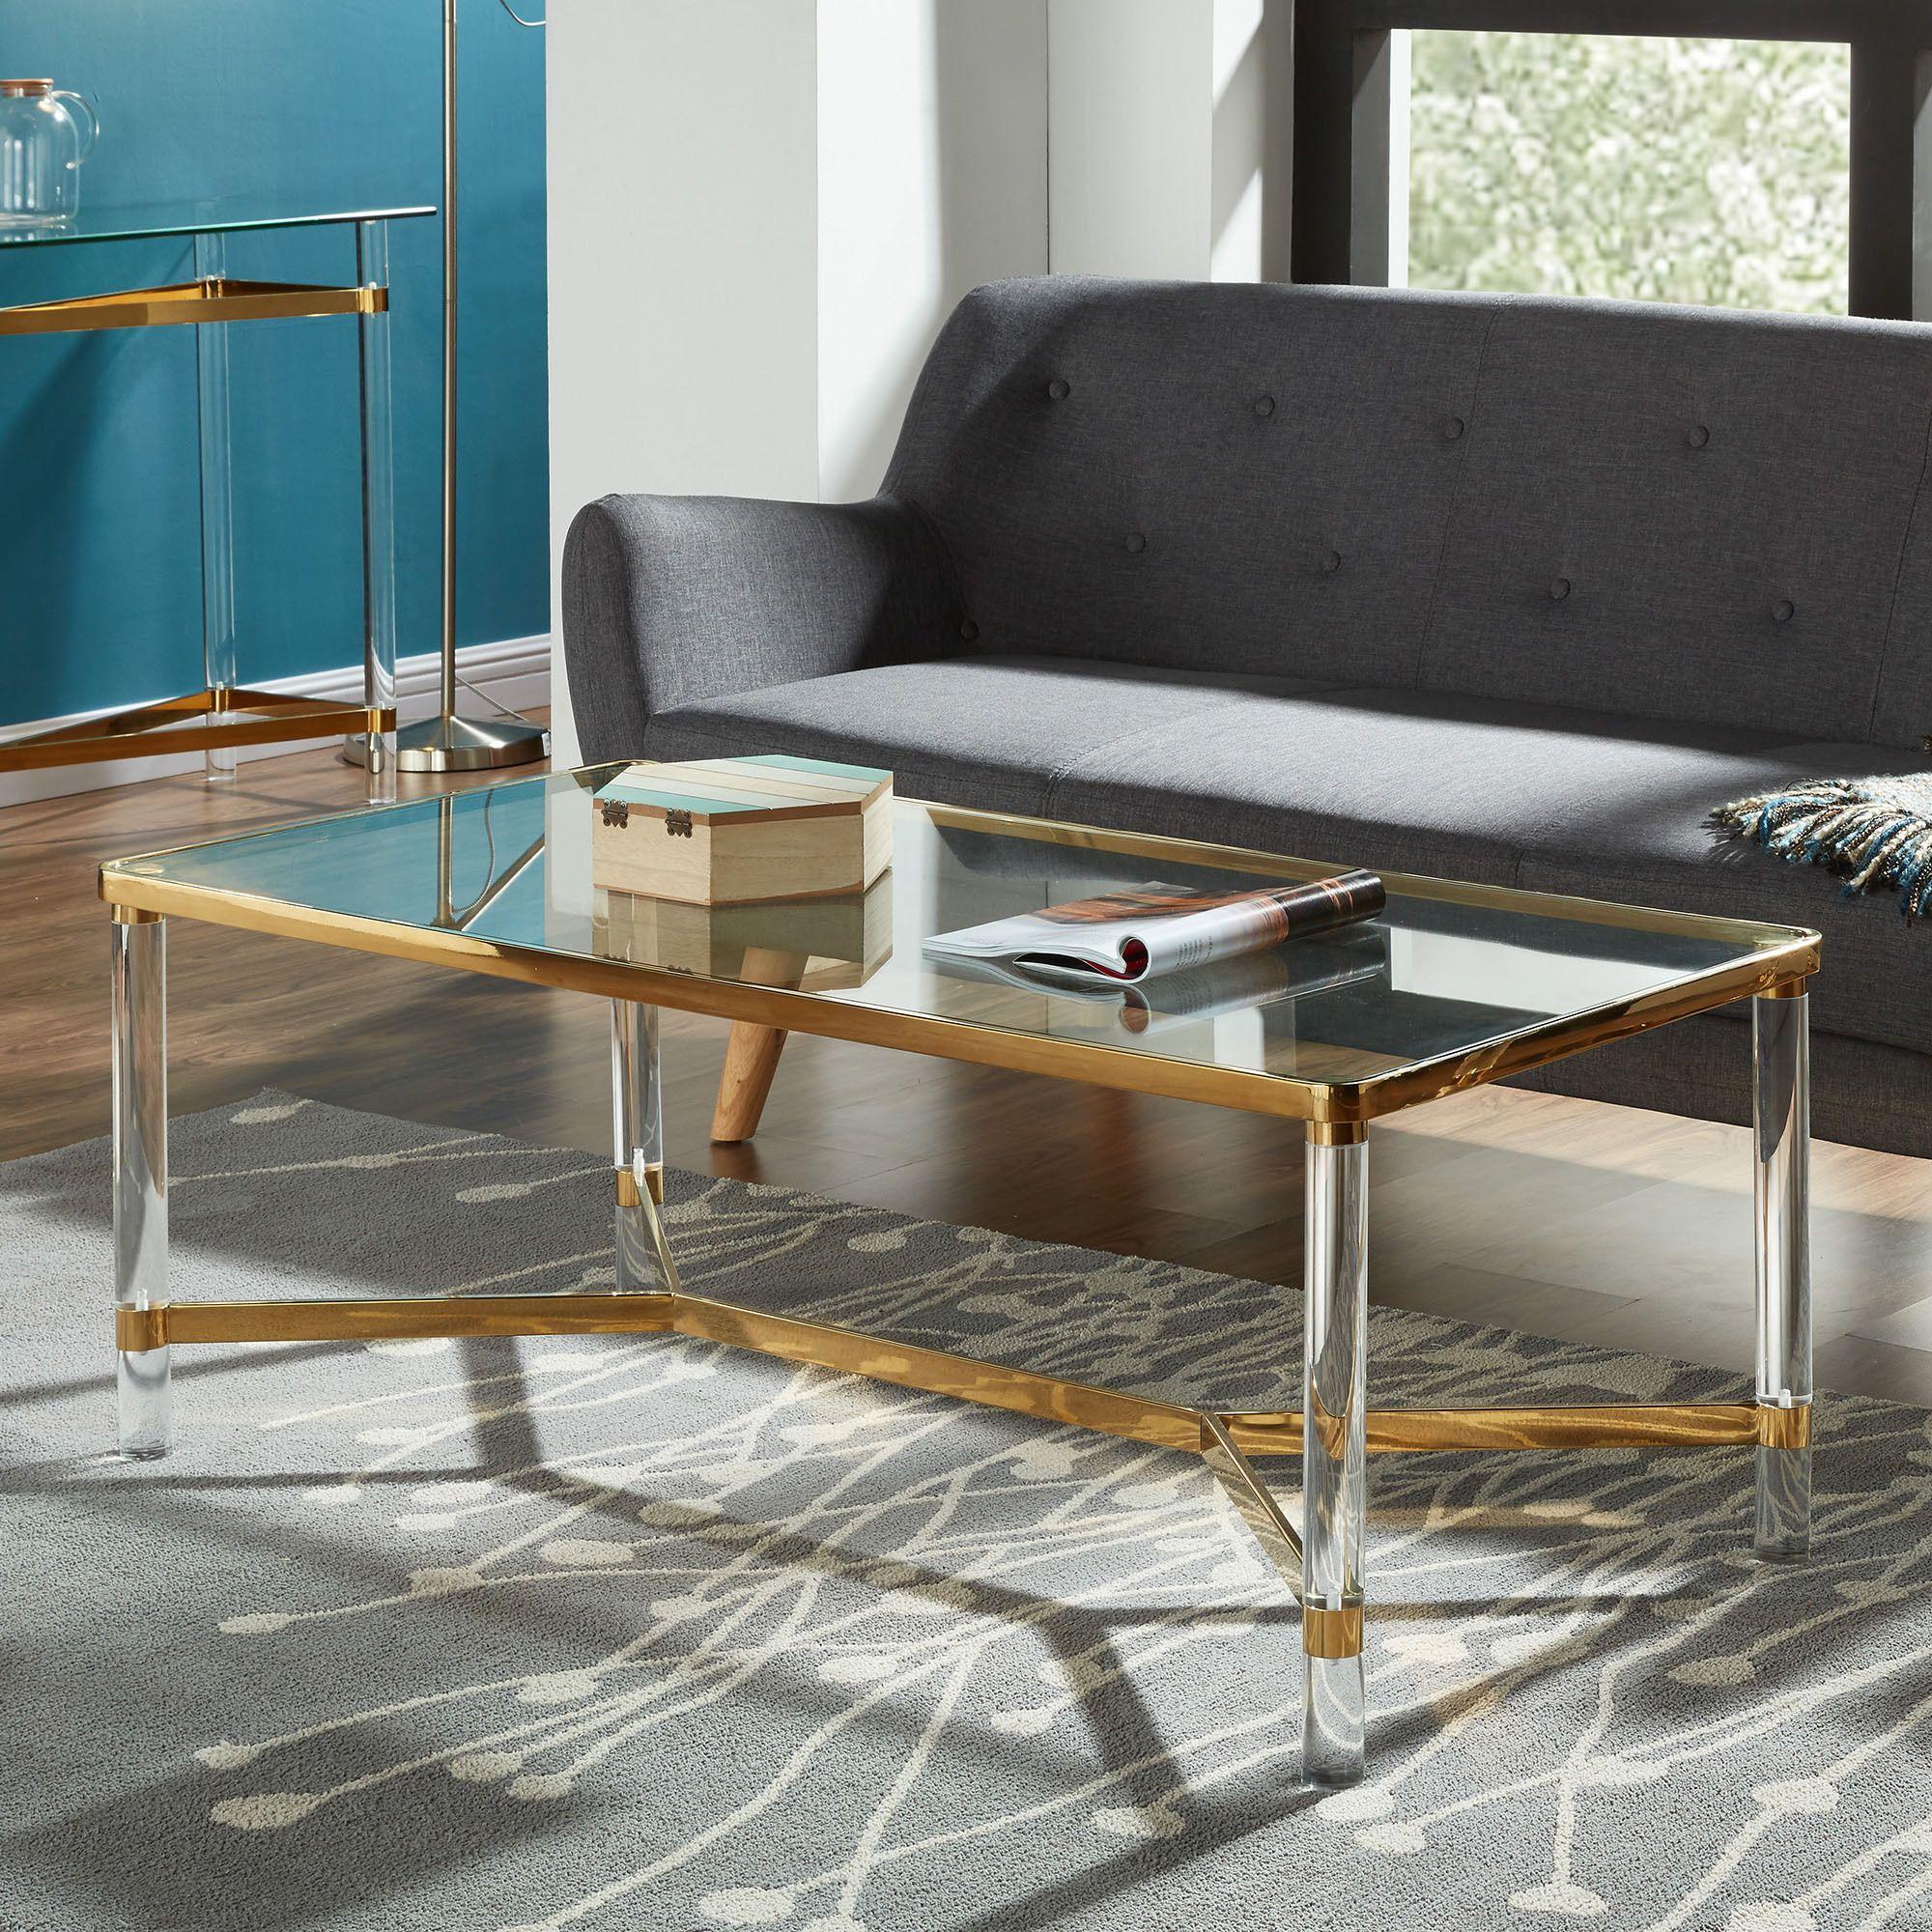 Morelia Mixed Media Metal Glass and Acrylic Coffee Table